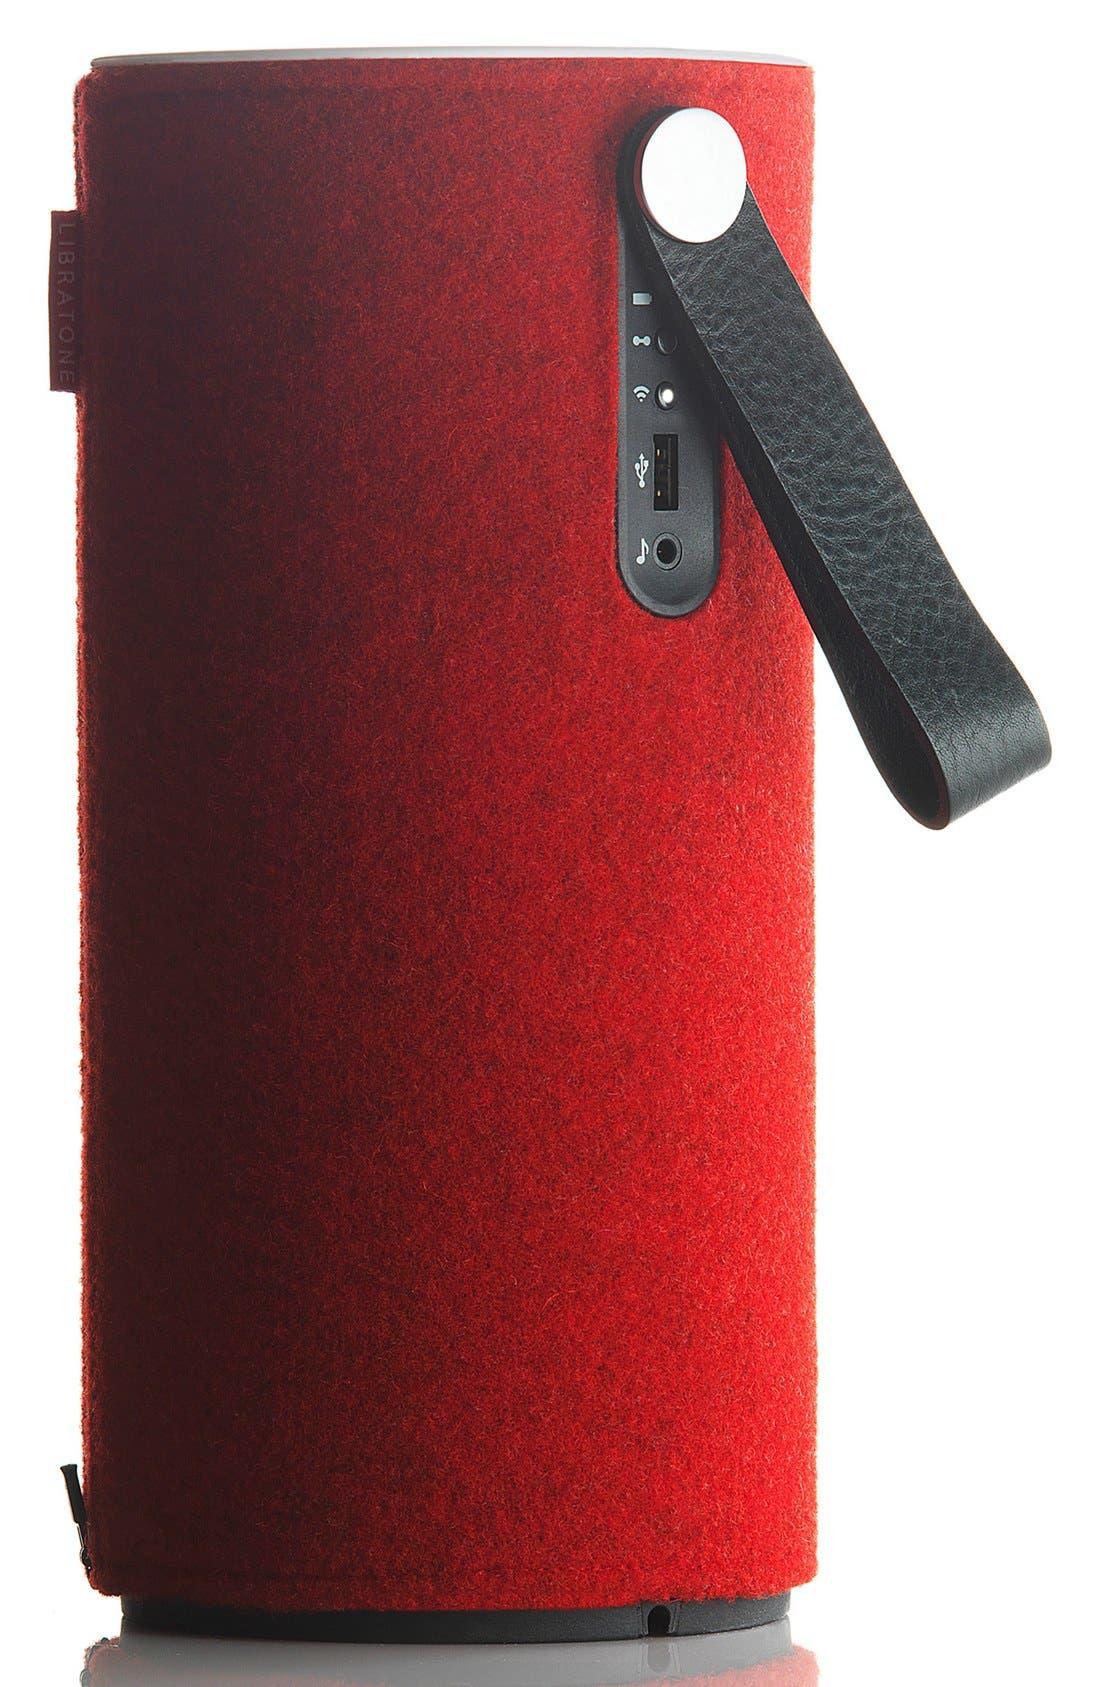 Alternate Image 2  - Libratone™ 'ZIPP - Classic' Take Along Wireless Speaker with Interchangeable Covers